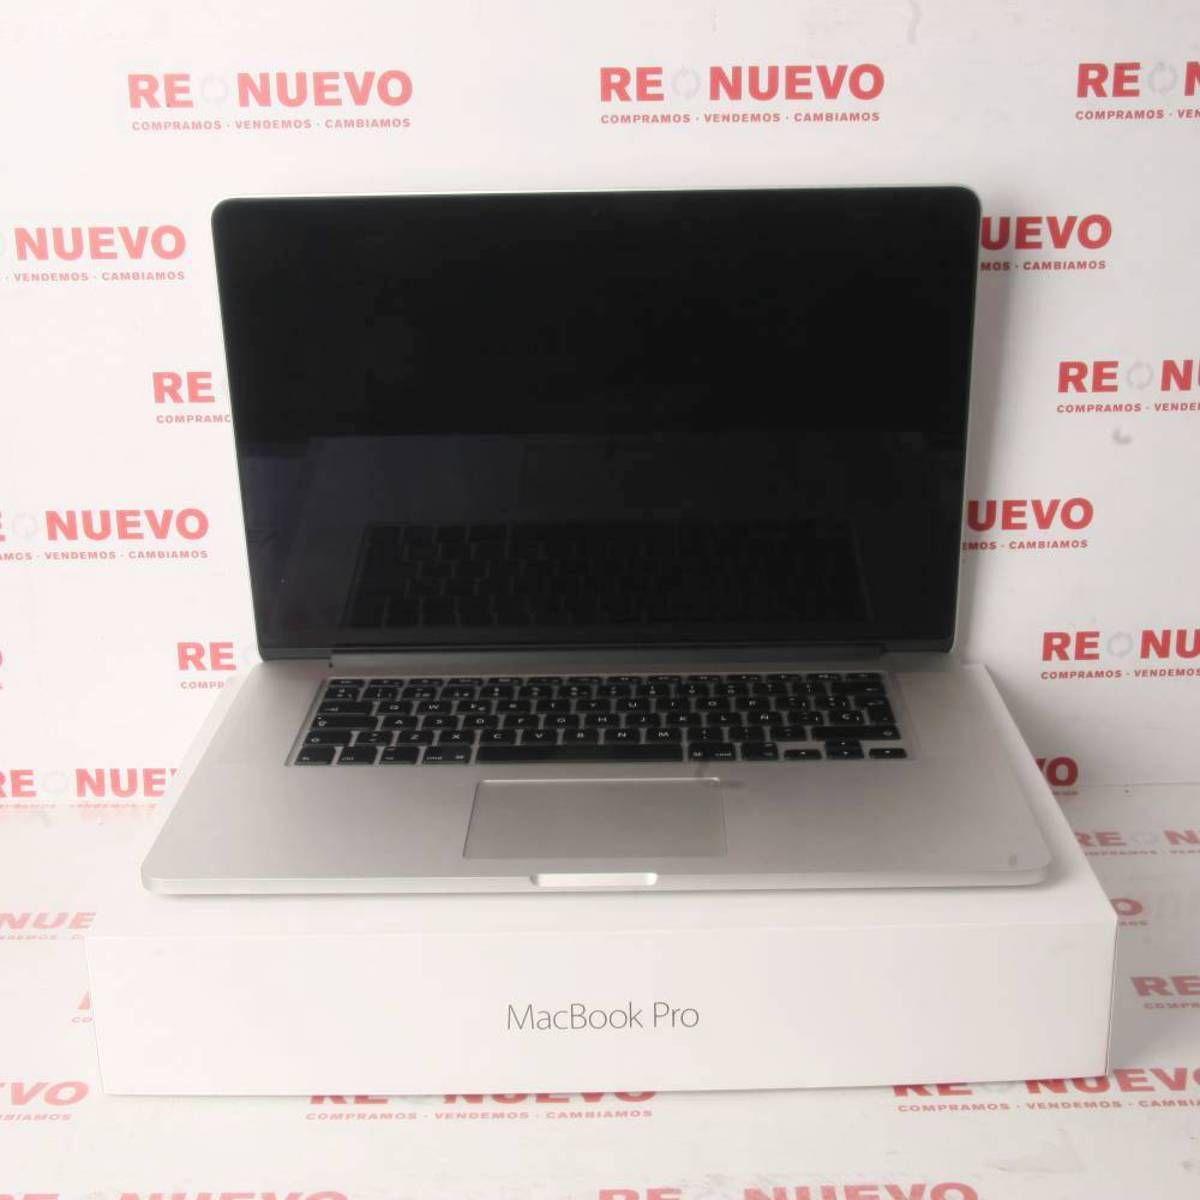 Macbook Pro 15 I7 A 2 5 Mediados 2014 E280282 Tienda Online De